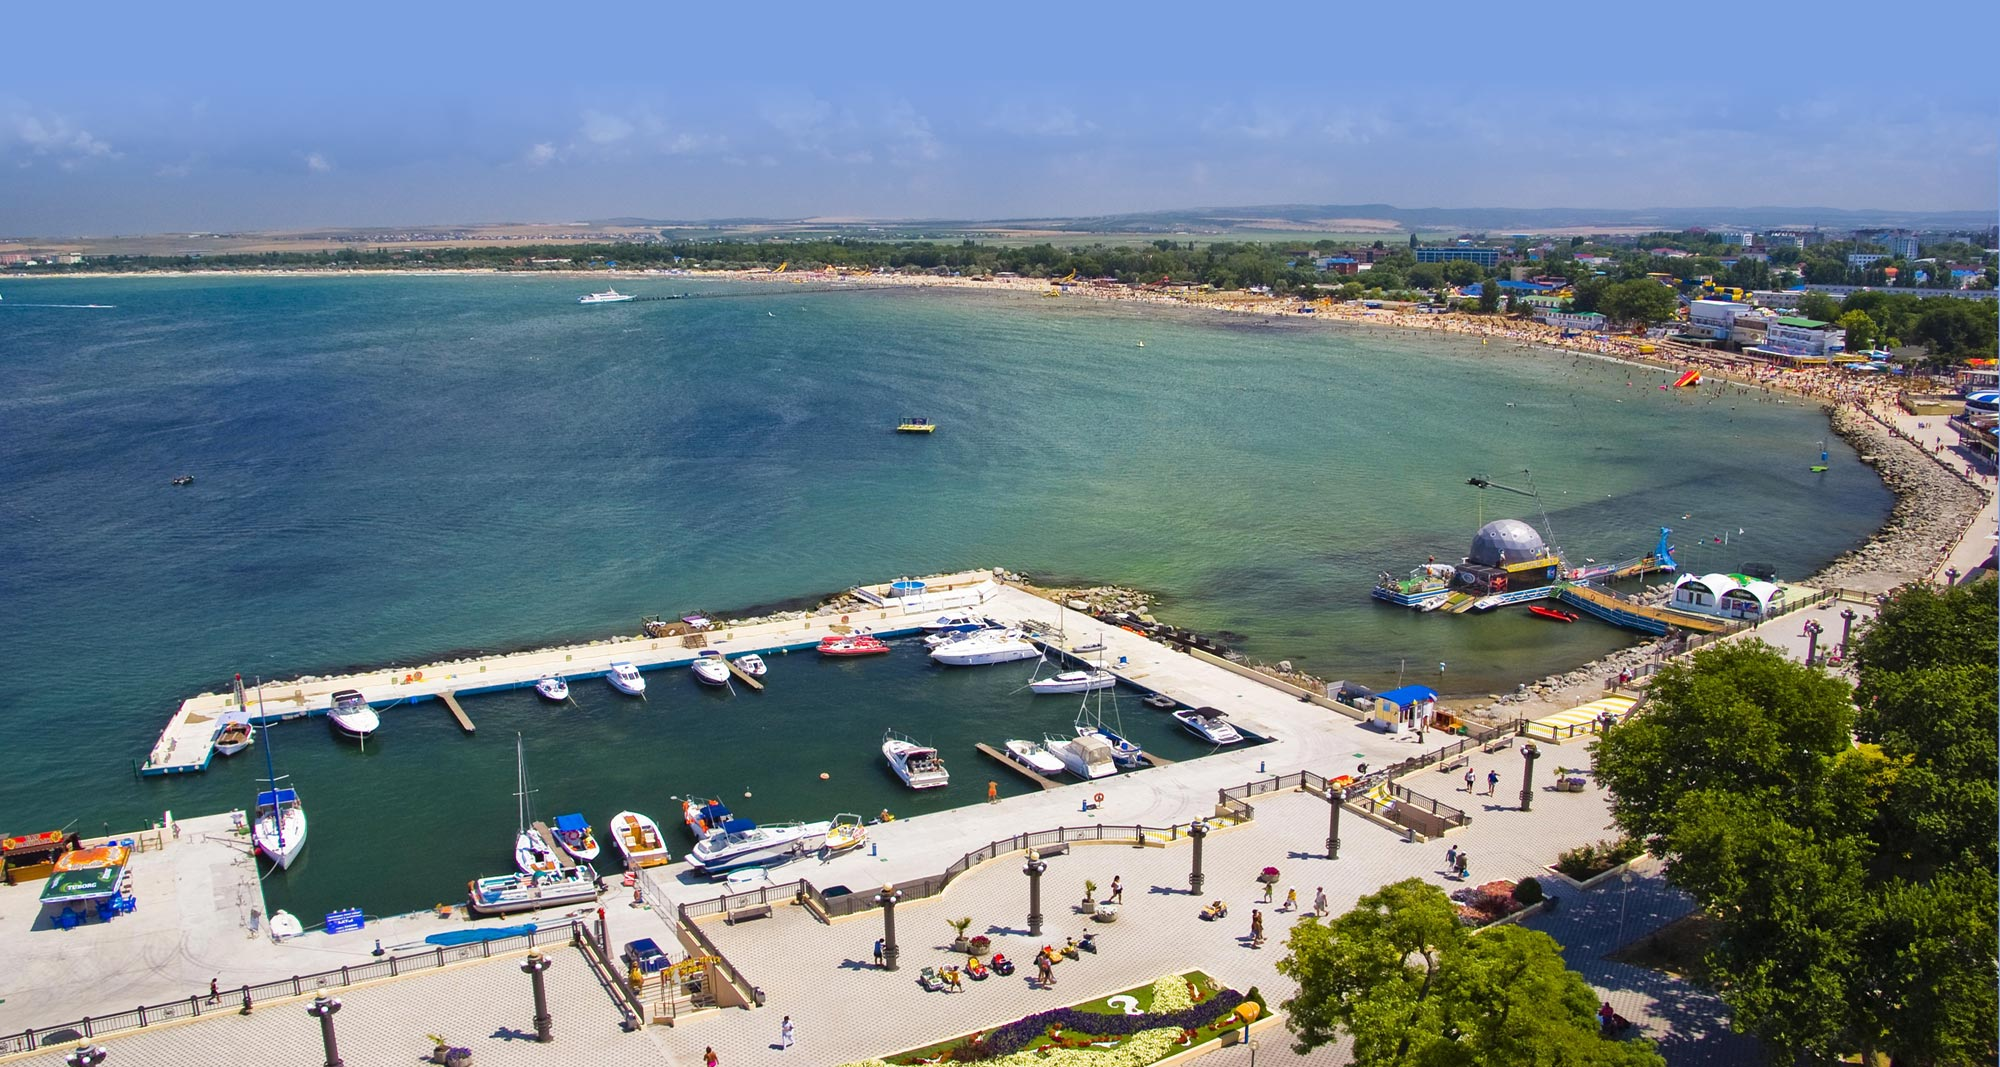 Анапе фото пляжа и города